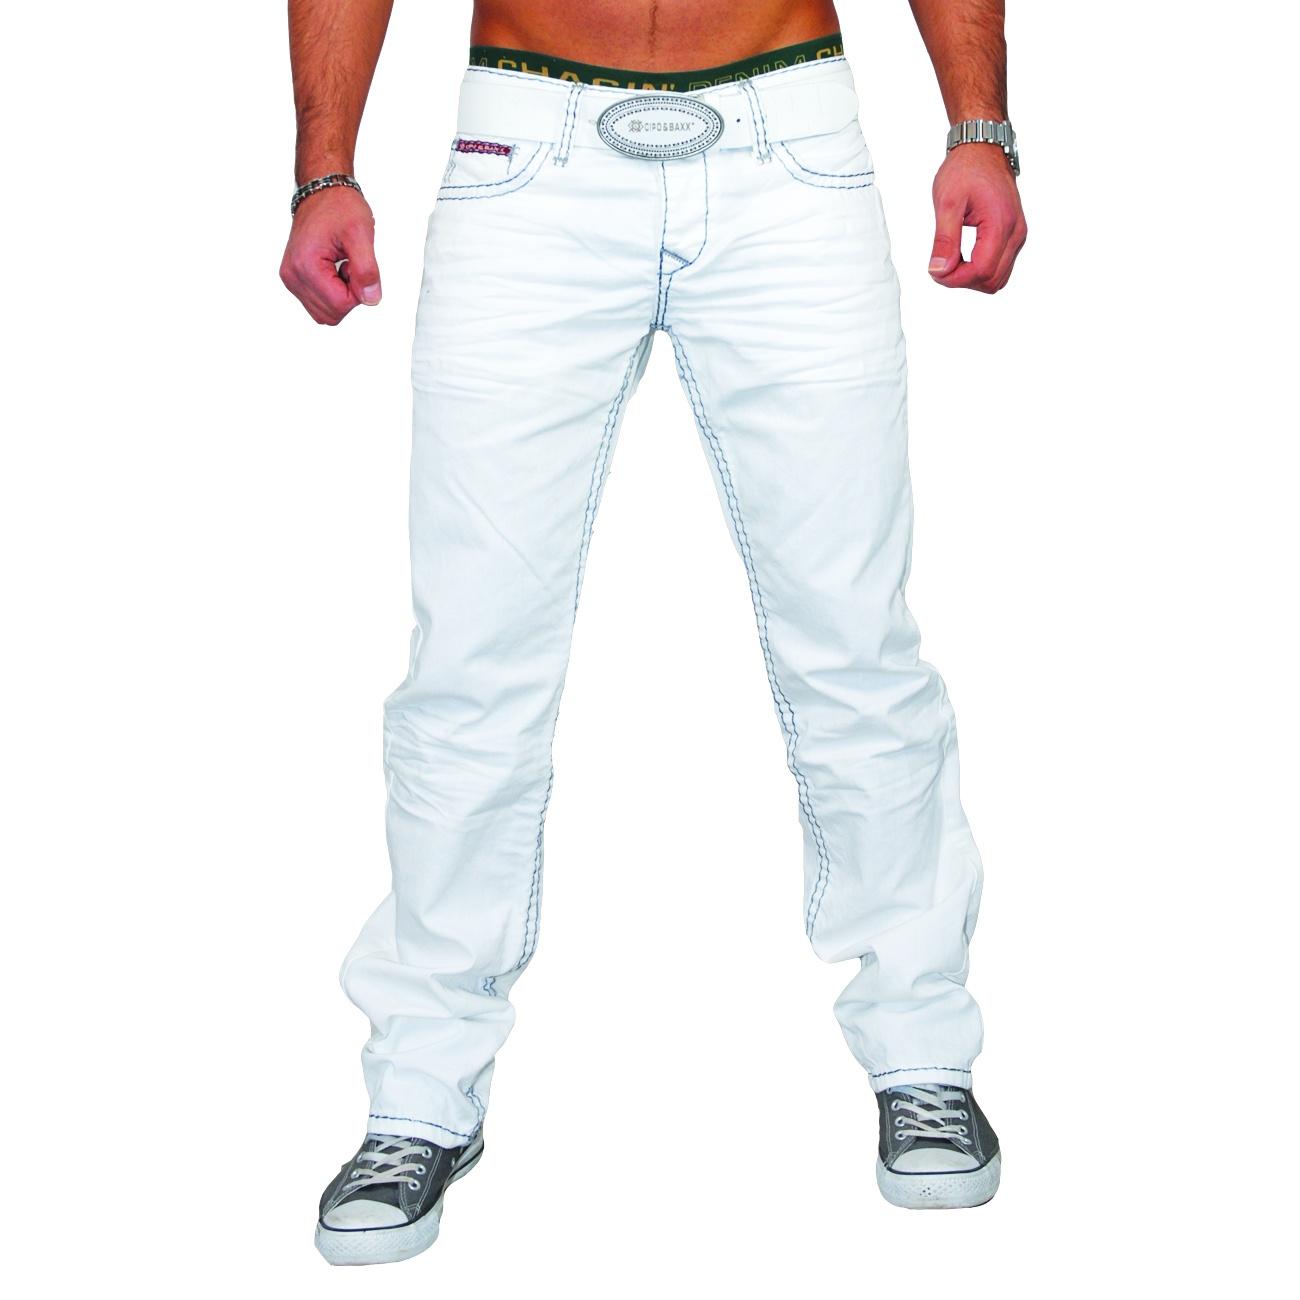 cipo baxx denim herren club dicke naht style jeans hose wei c 701 neu ebay. Black Bedroom Furniture Sets. Home Design Ideas